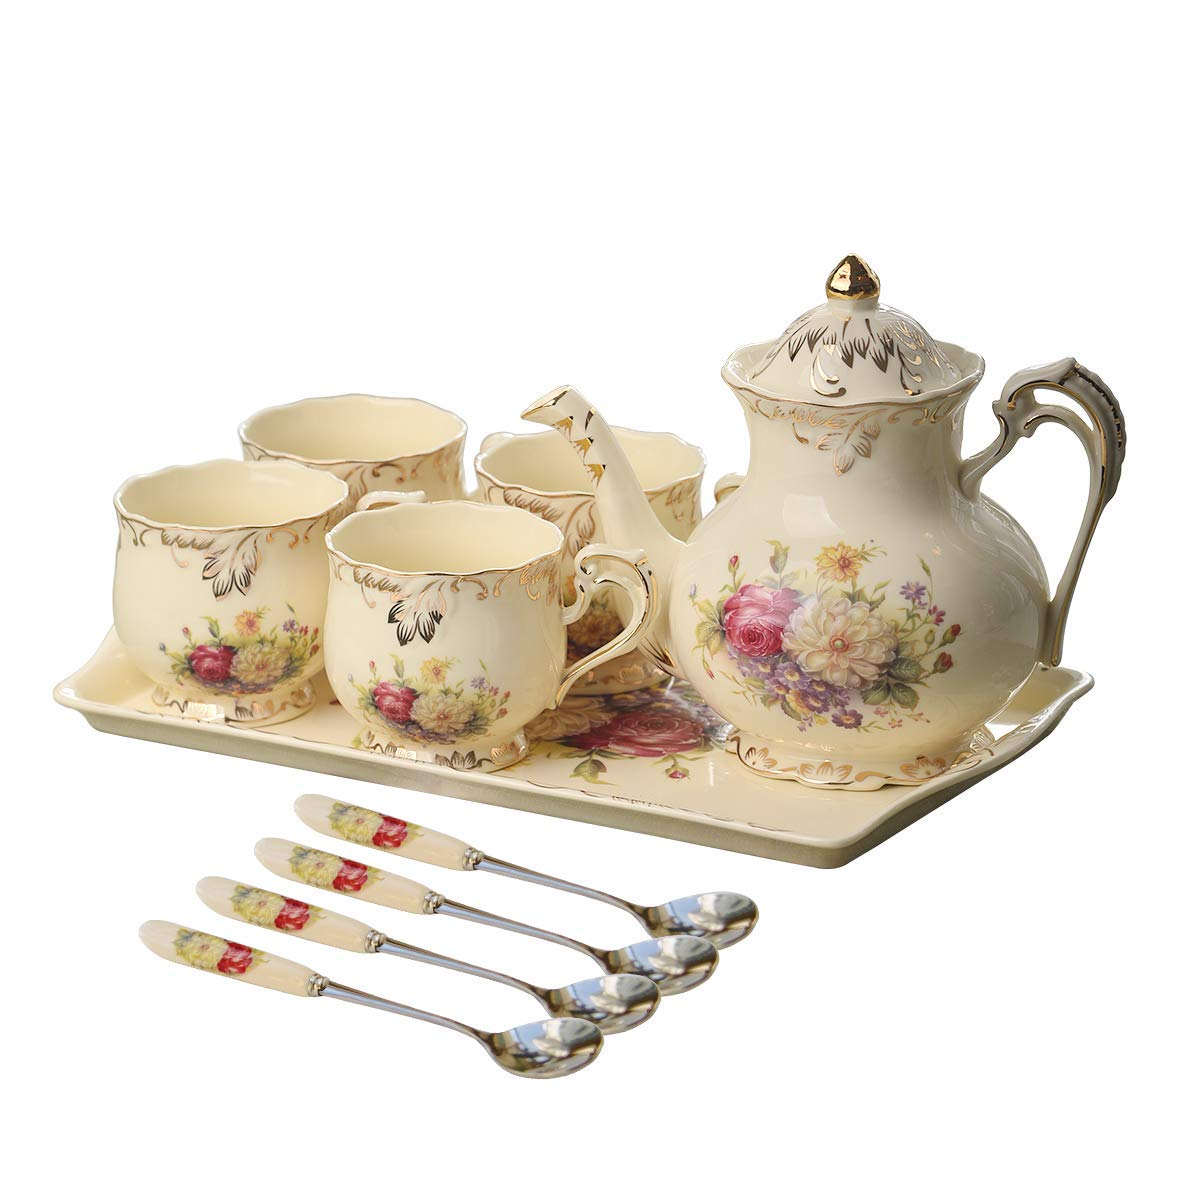 YOLIFE Flowering Shrubs Ivory Ceramic Tea Set,Porcelain Tea Cups Set,Tea Party Service Set for Adults